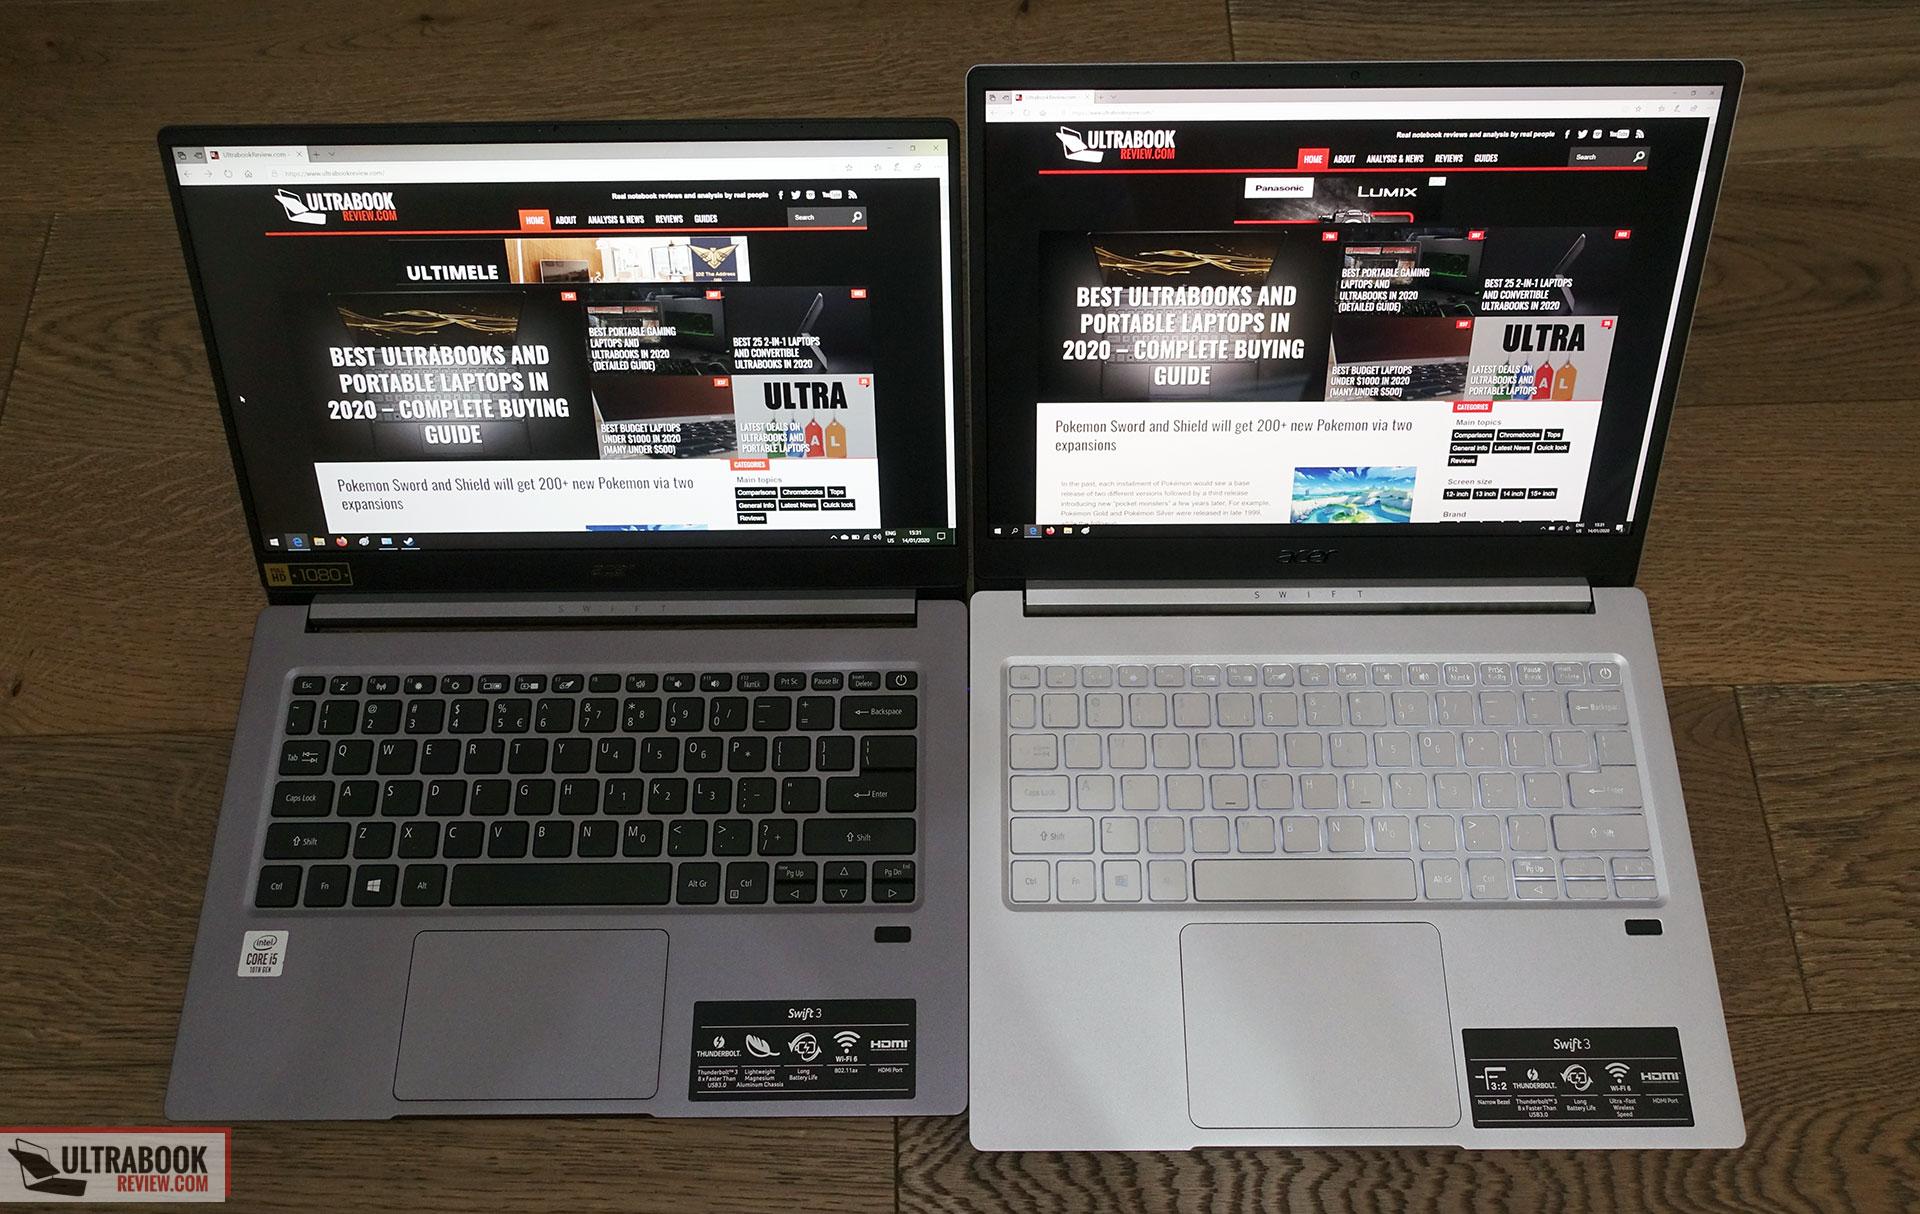 16:9 screen vs 3:2 screen